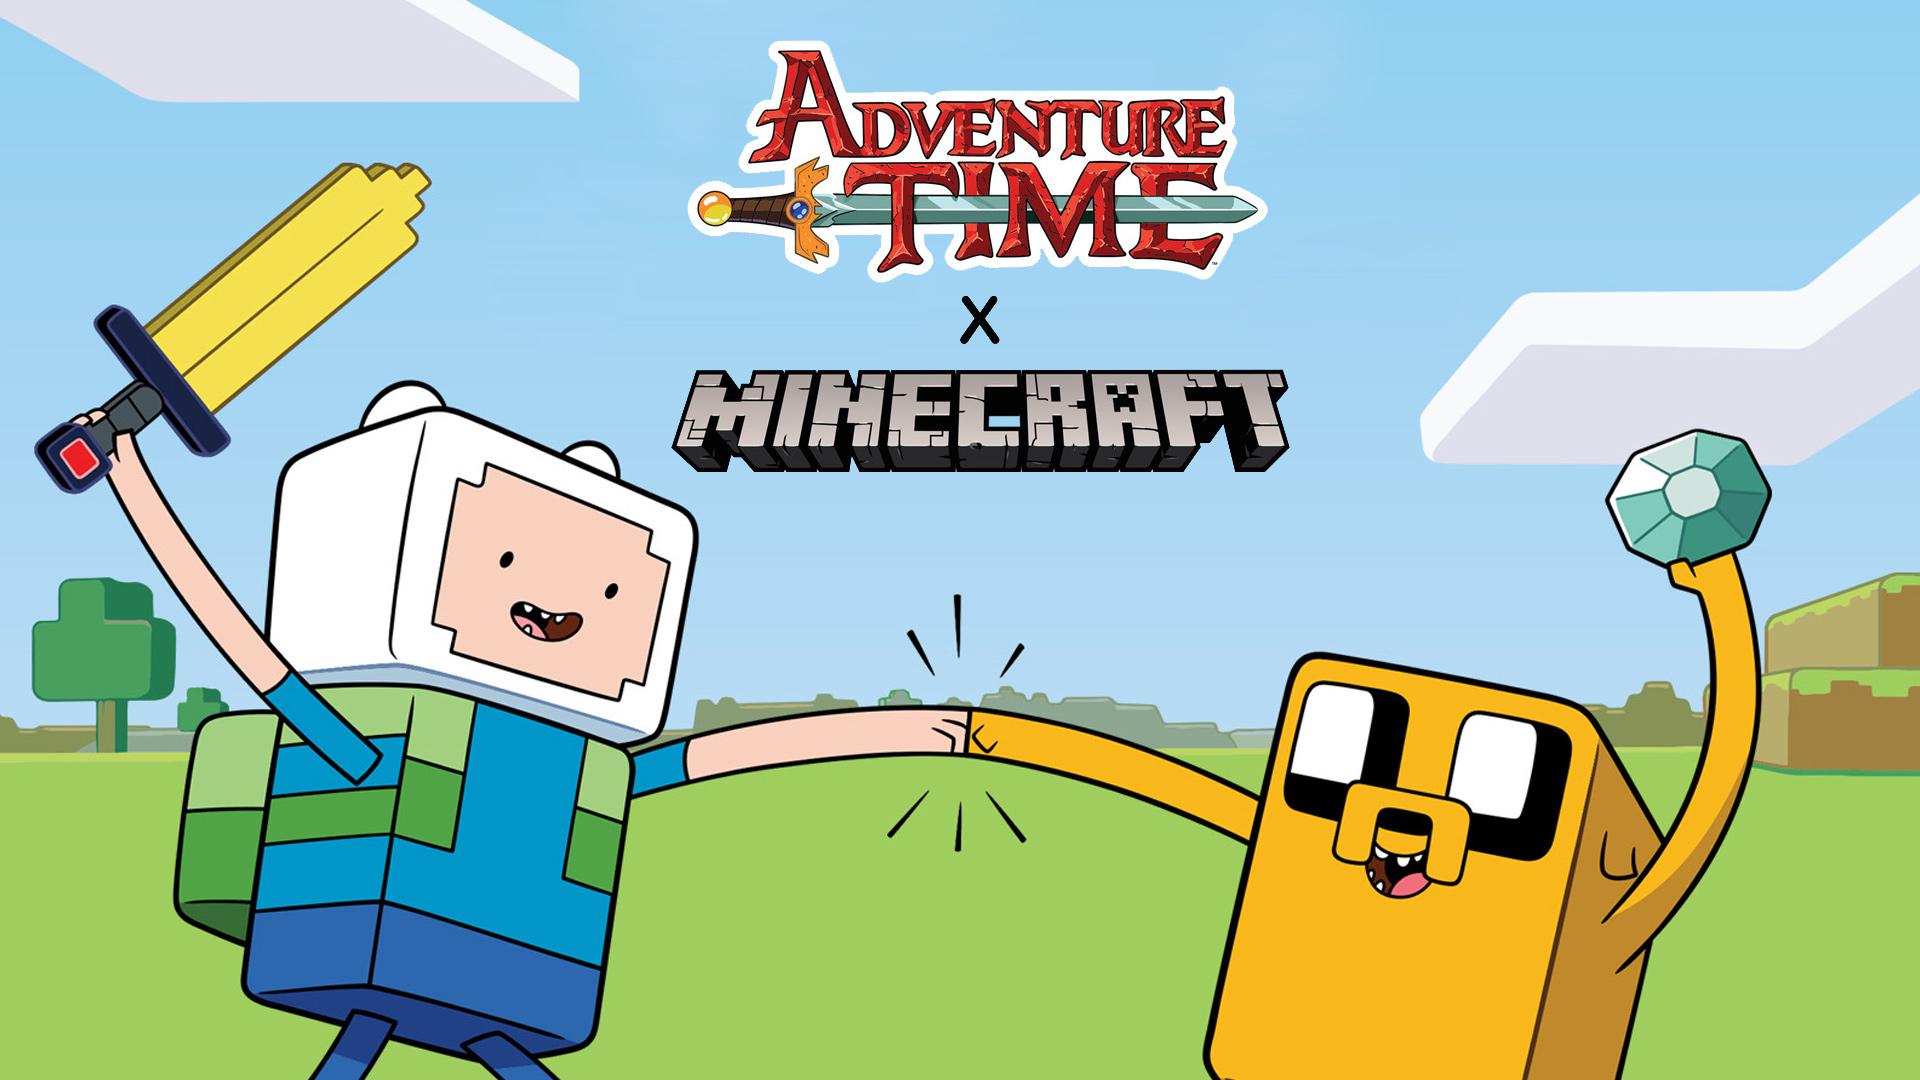 Adventure Time x Minecraft: Diamonds and Lemons Season 1